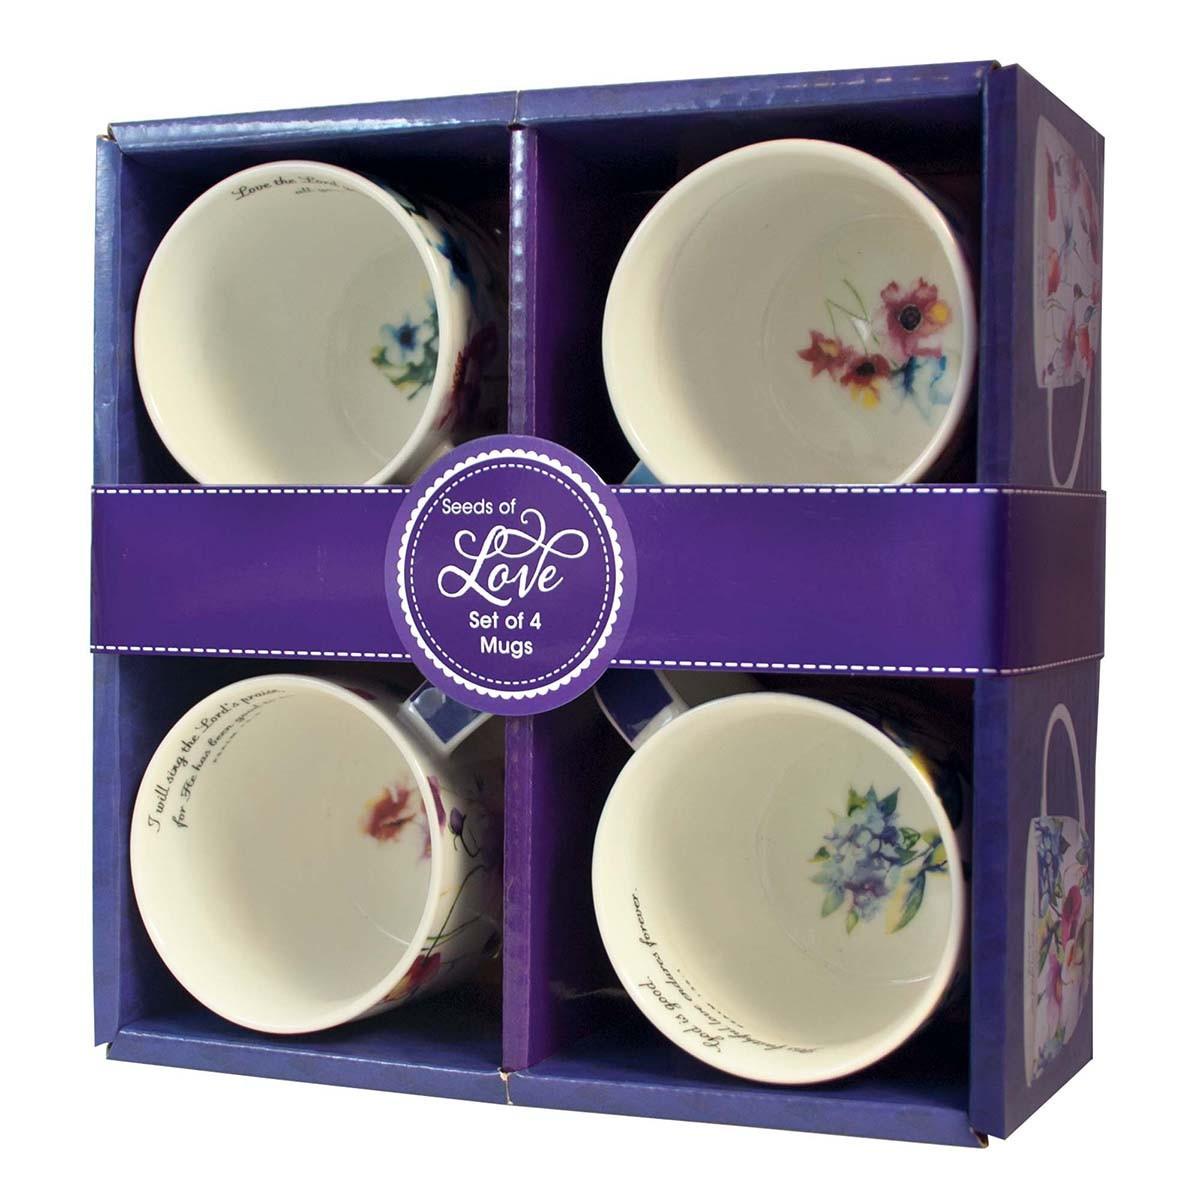 Coffee Mugs: Seeds of Love set of four